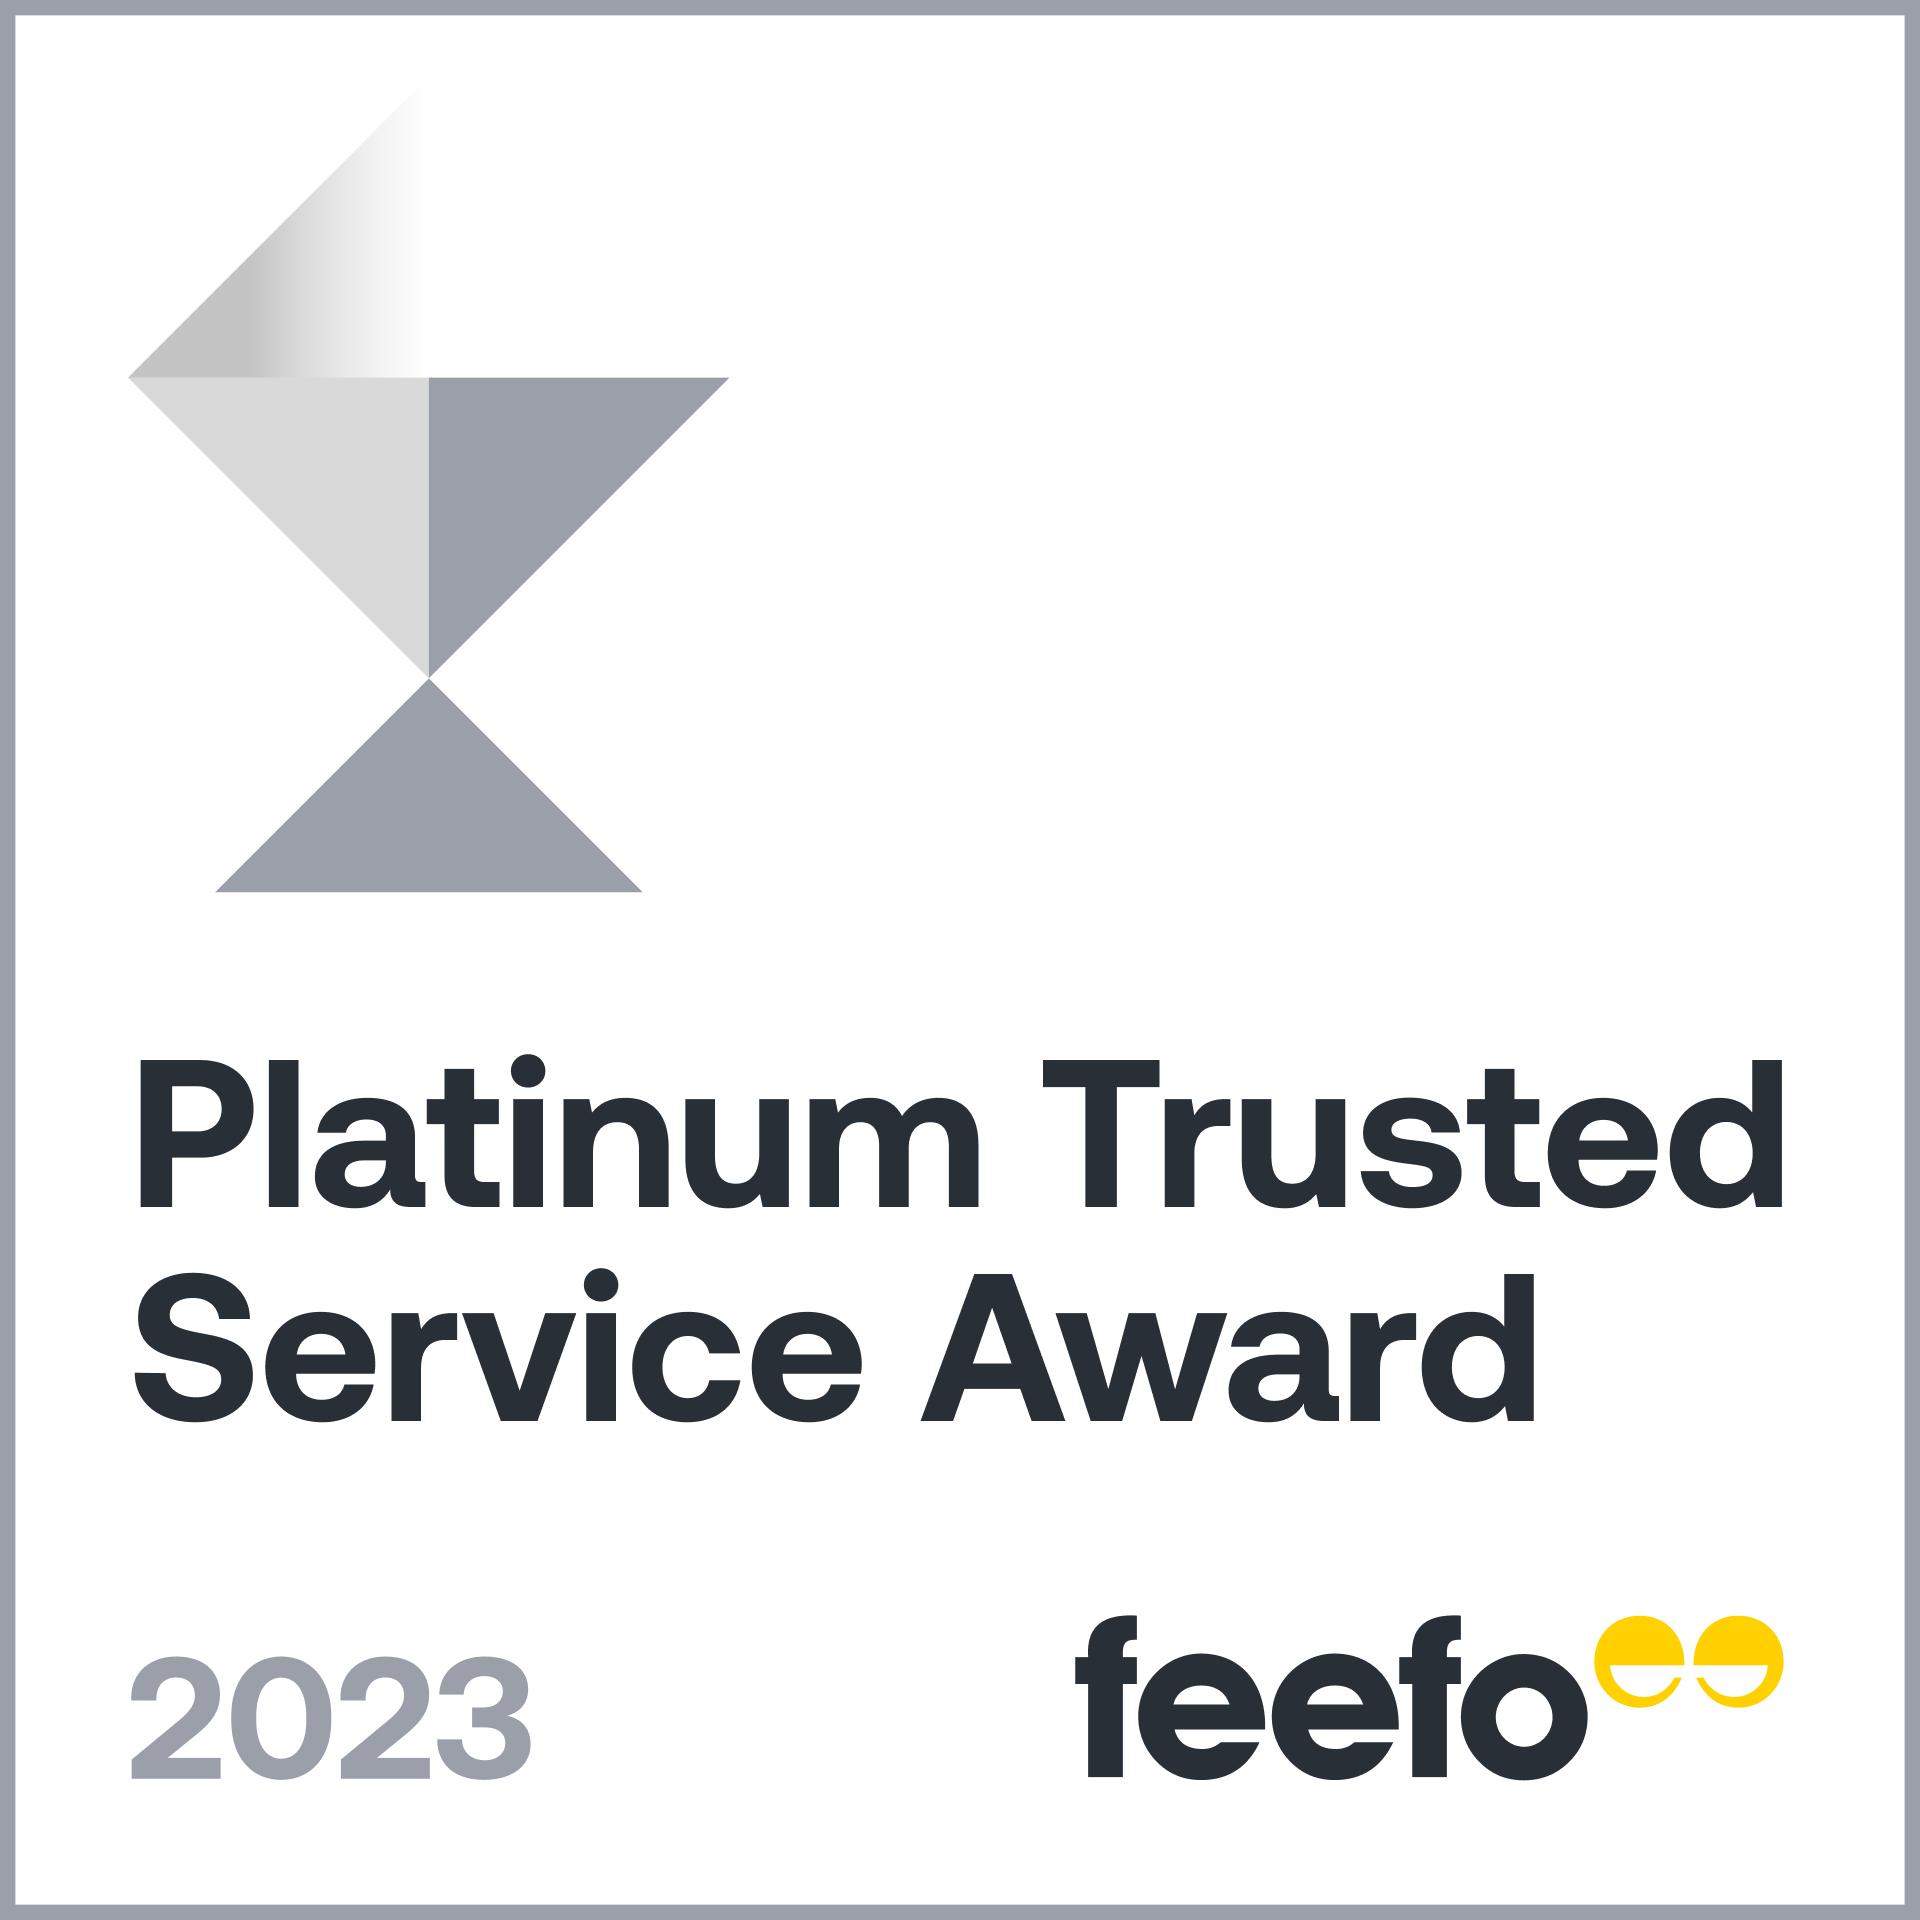 namelabelco customer service reviews